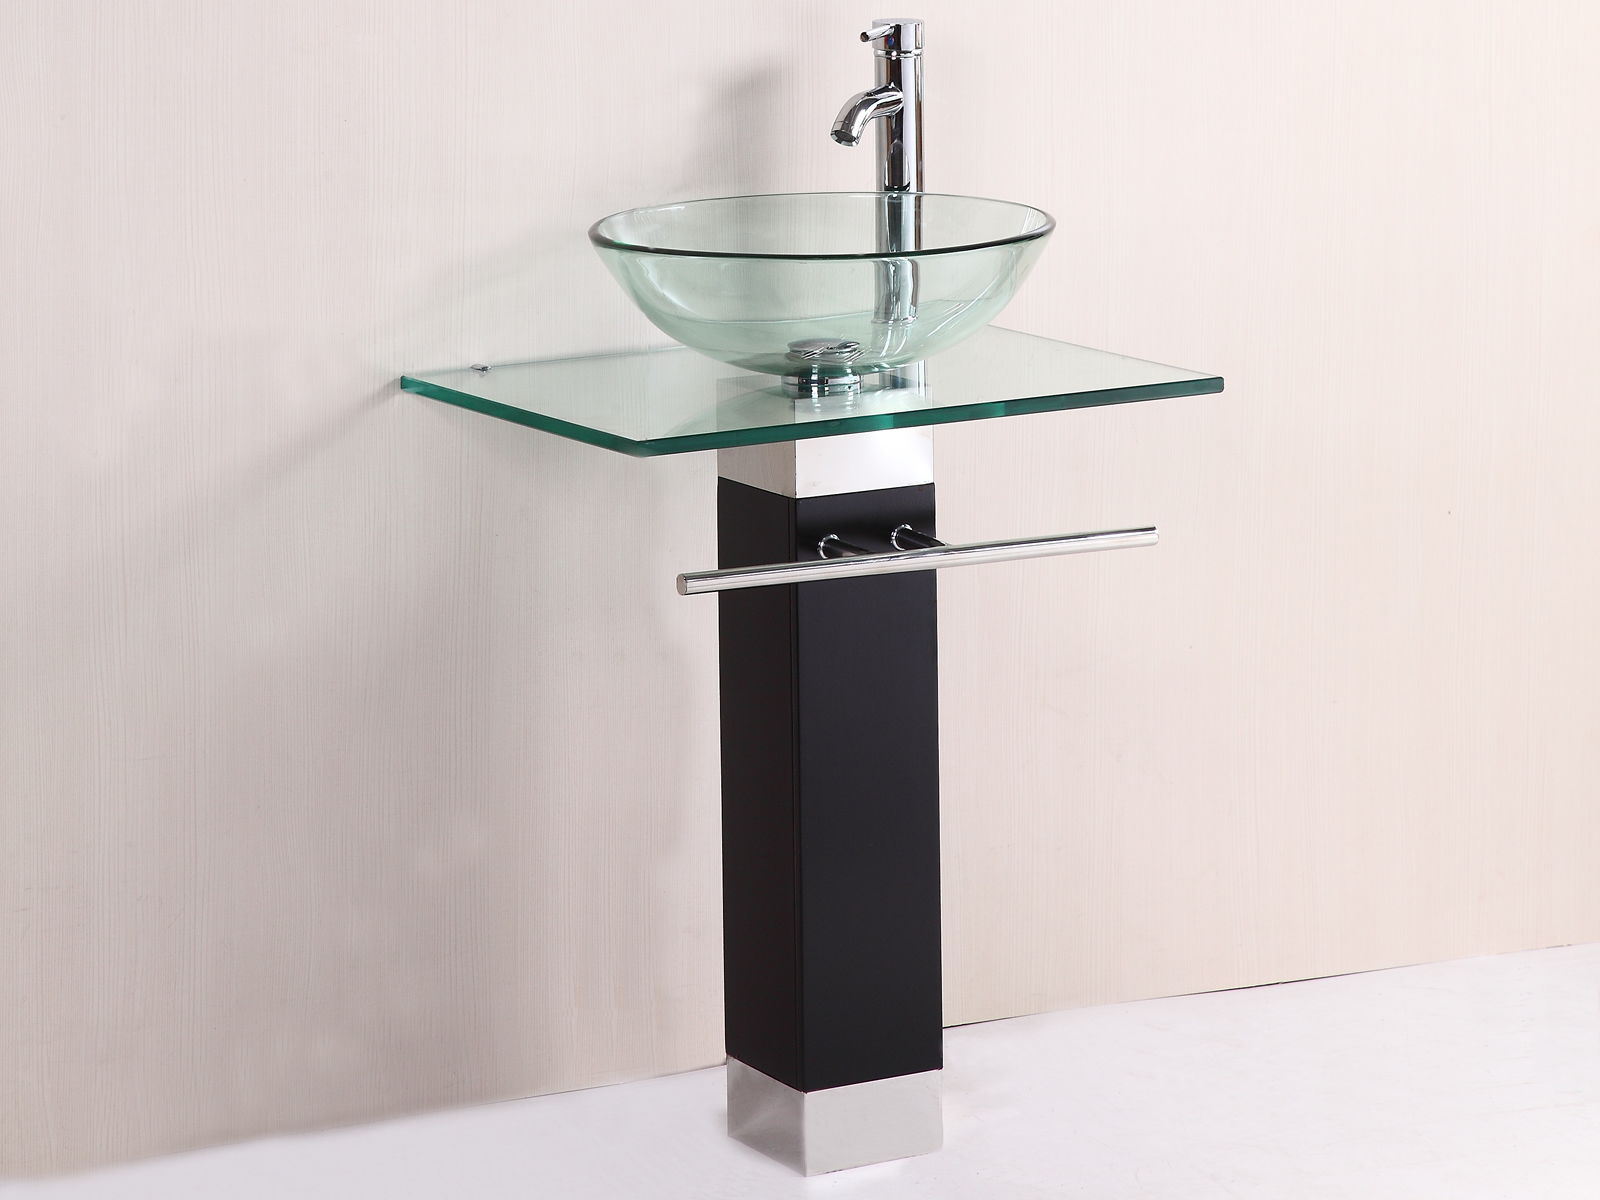 20 Glass Sink Design Ideas For Bathroom